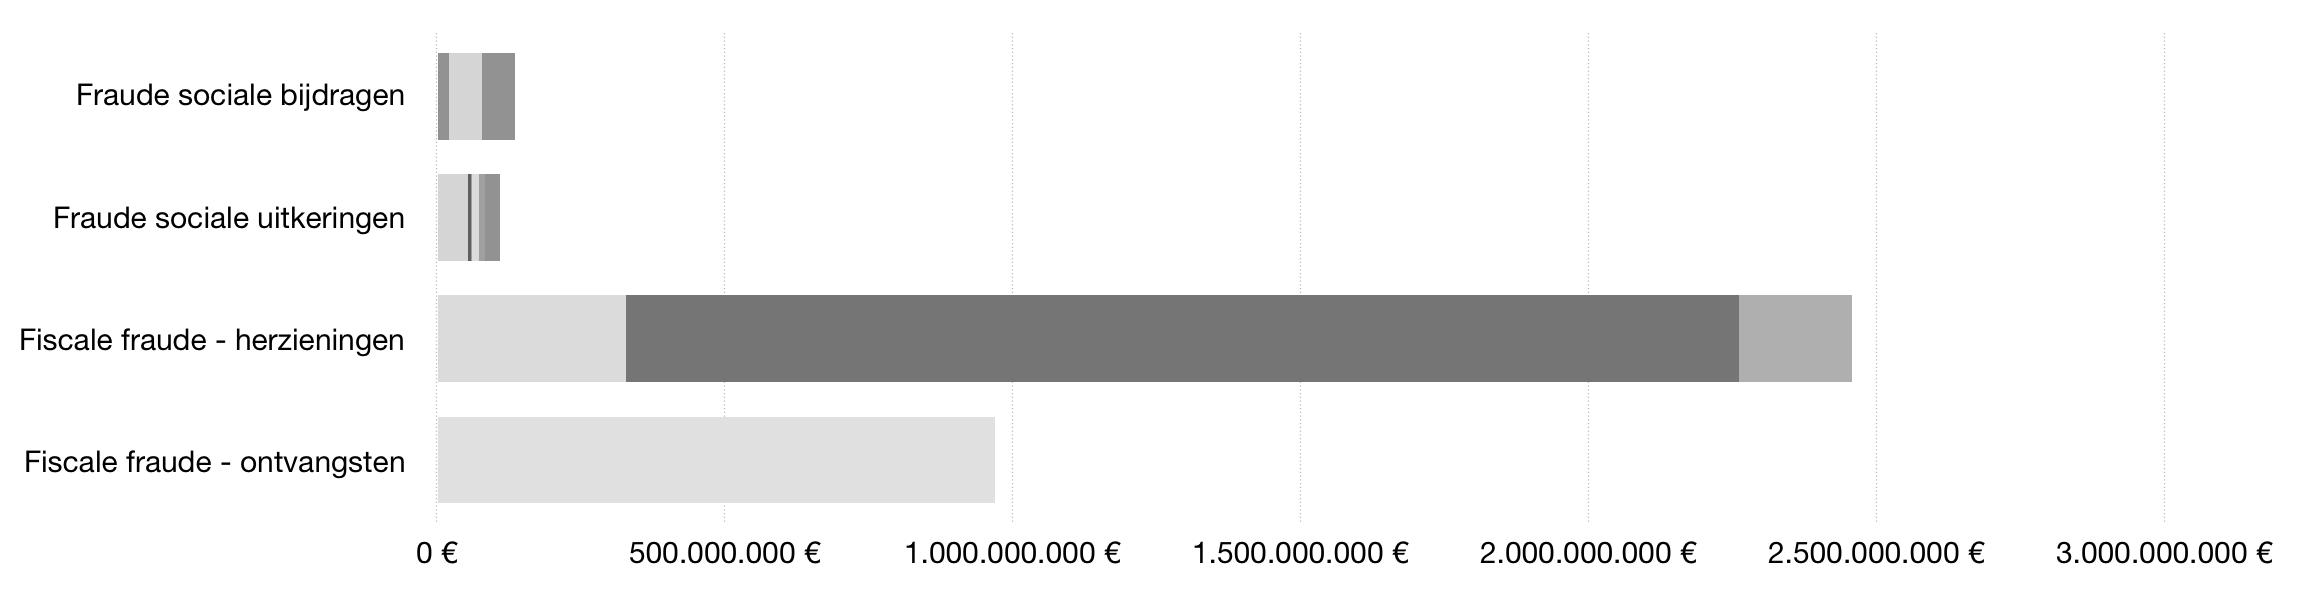 Grafiek drie.png